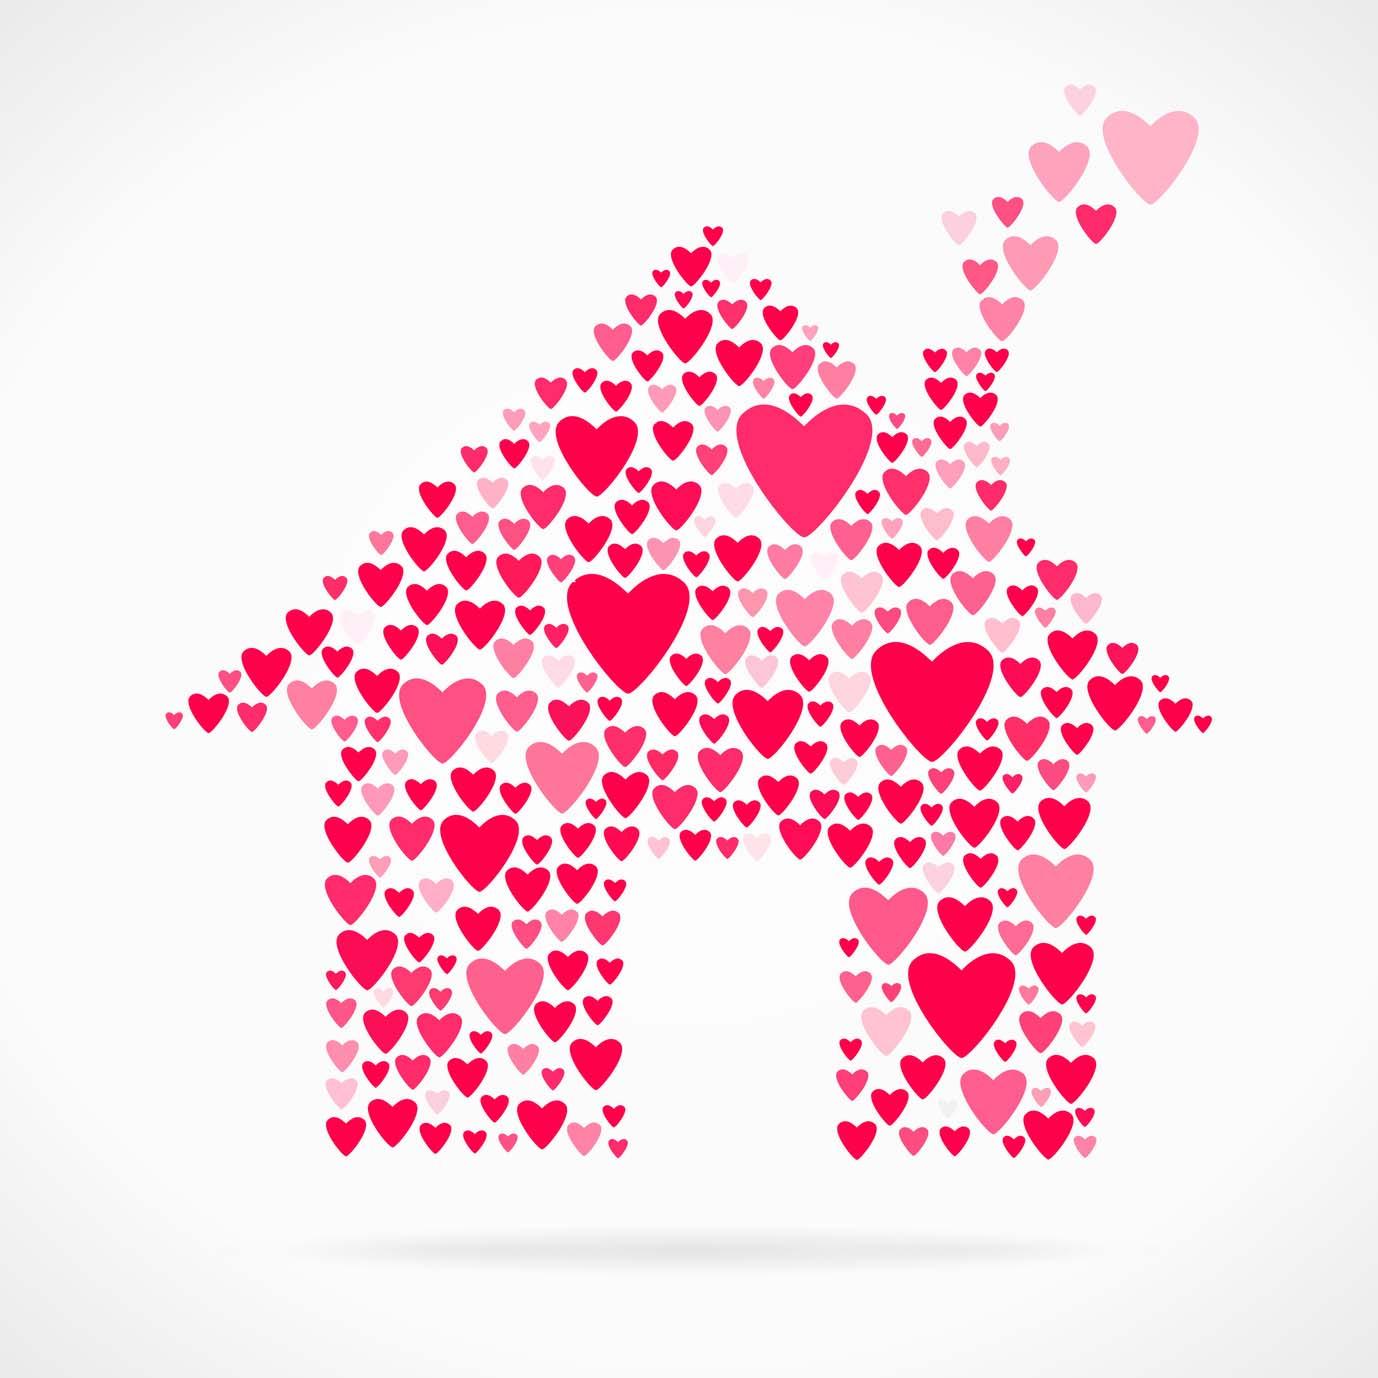 houseofhearts.jpg